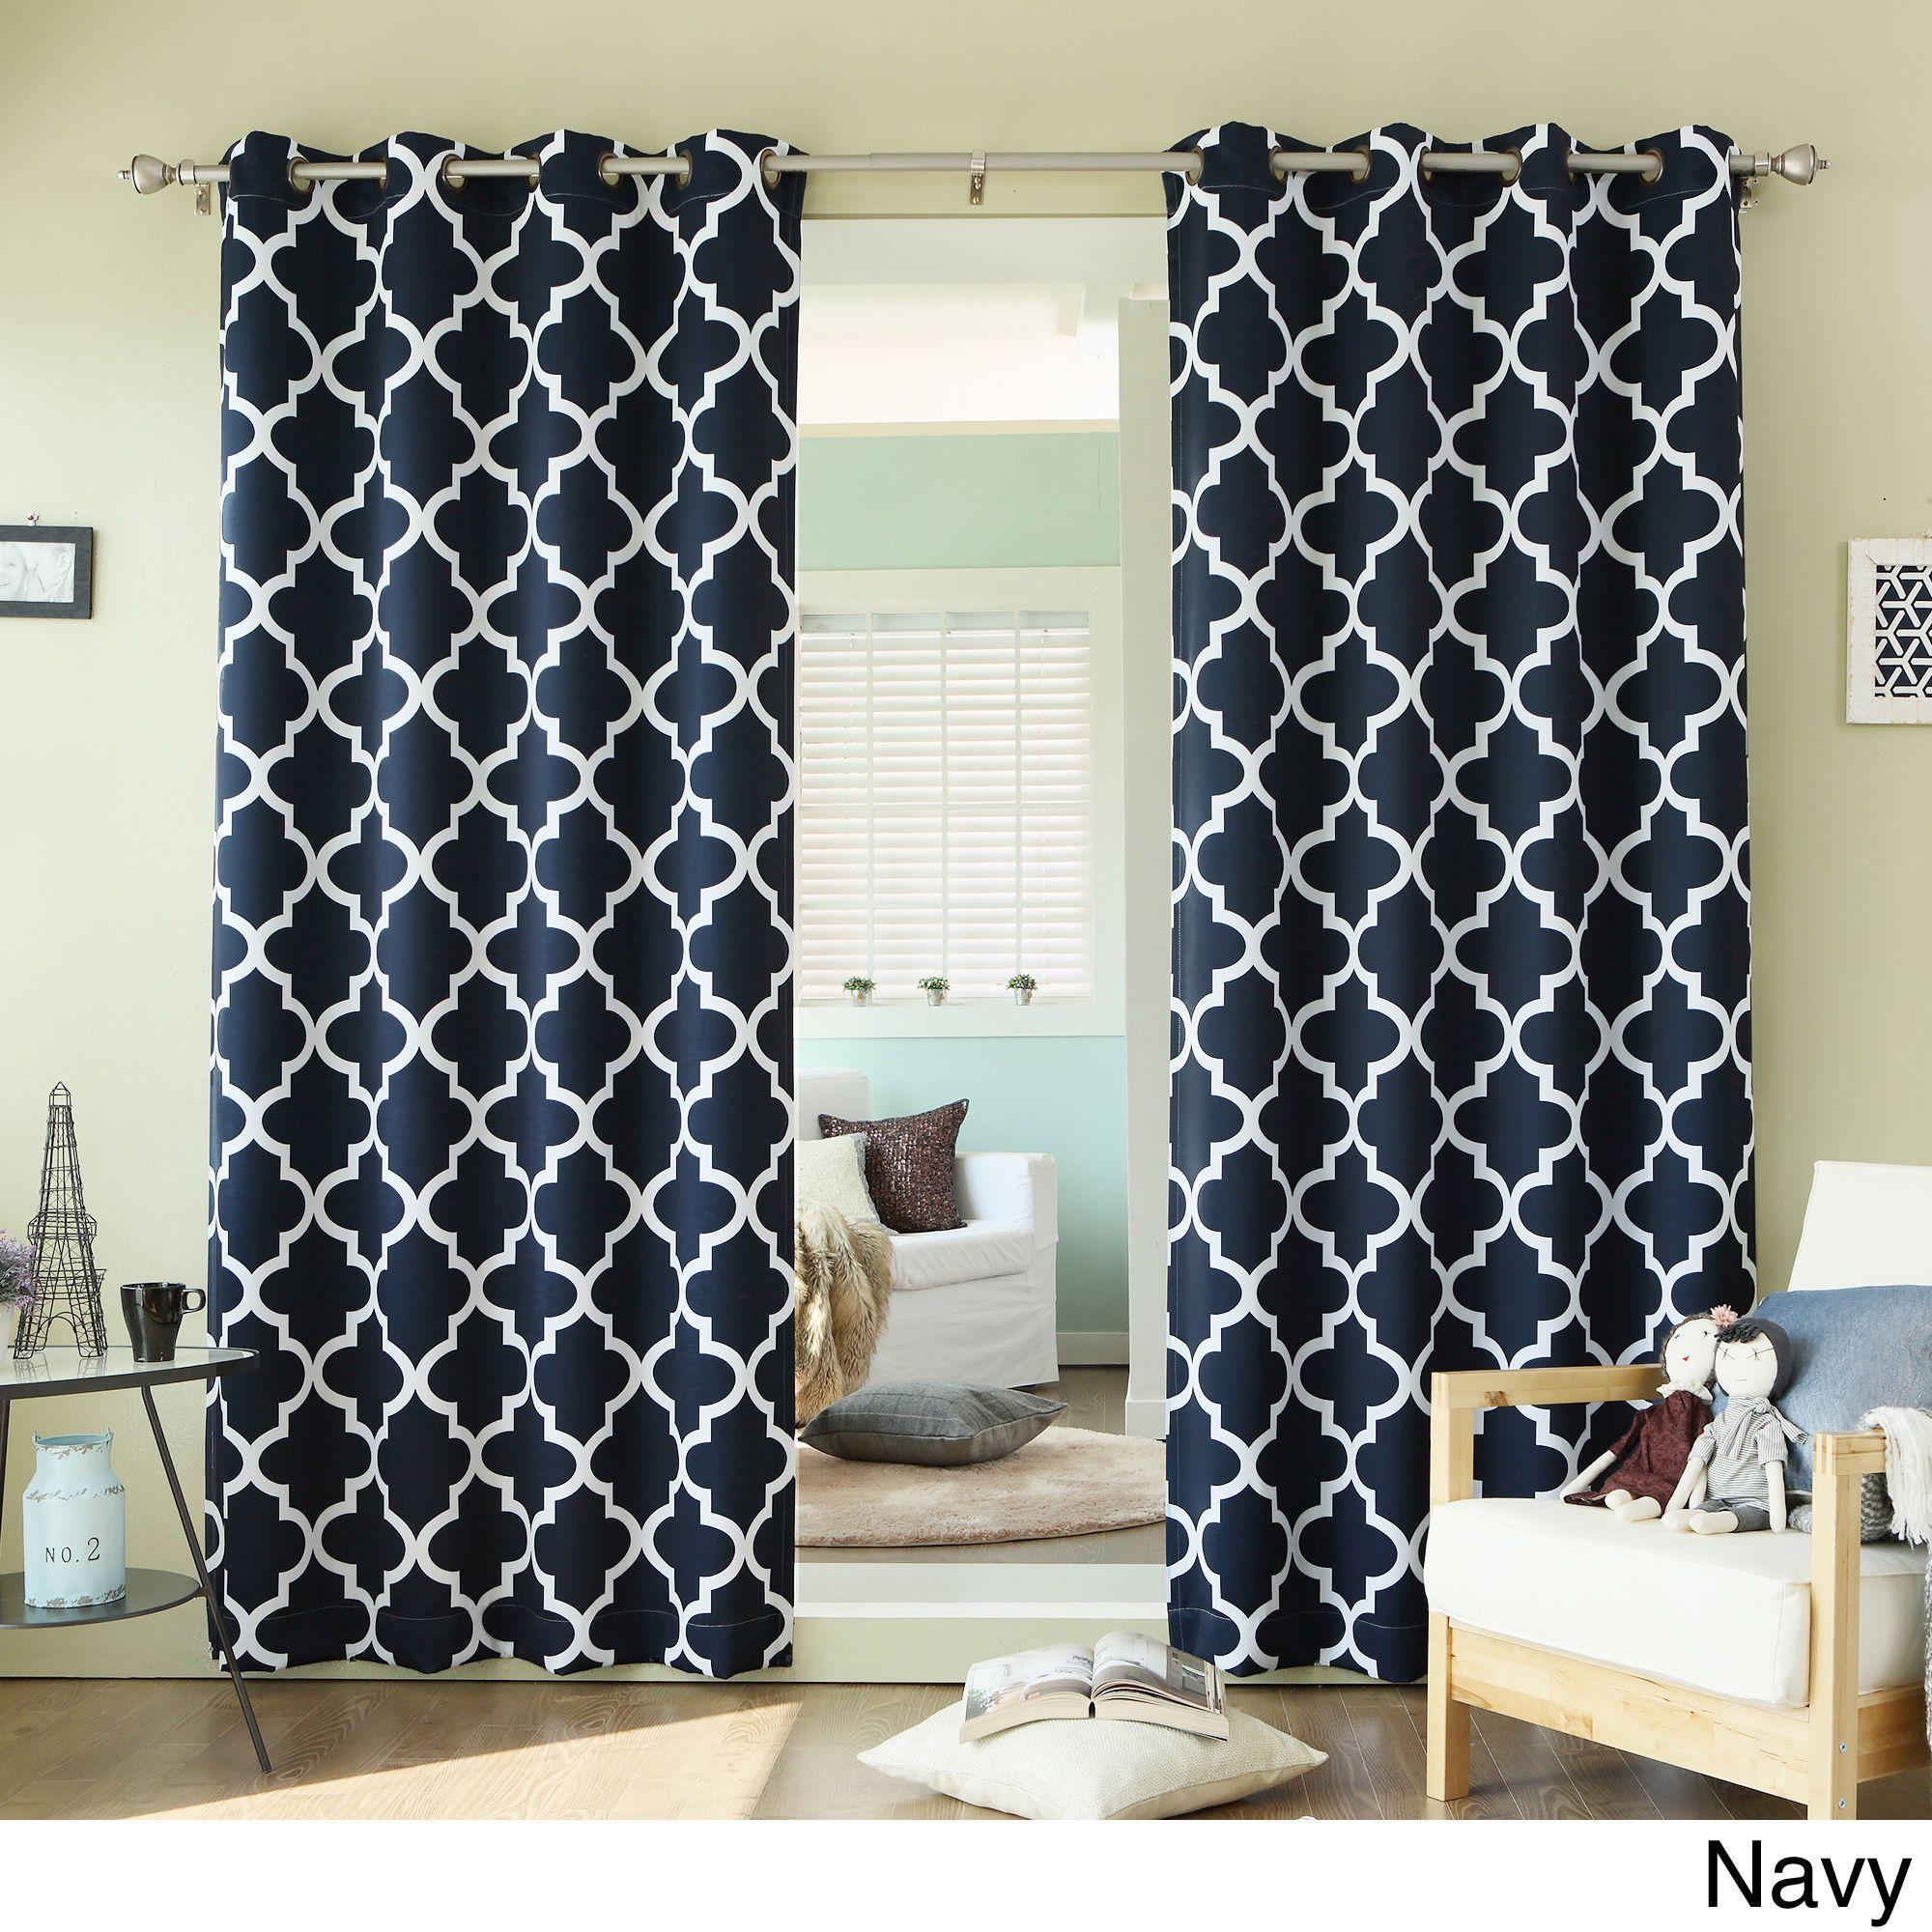 Aurora home moroccan tile inch room darkening curtain panel pair